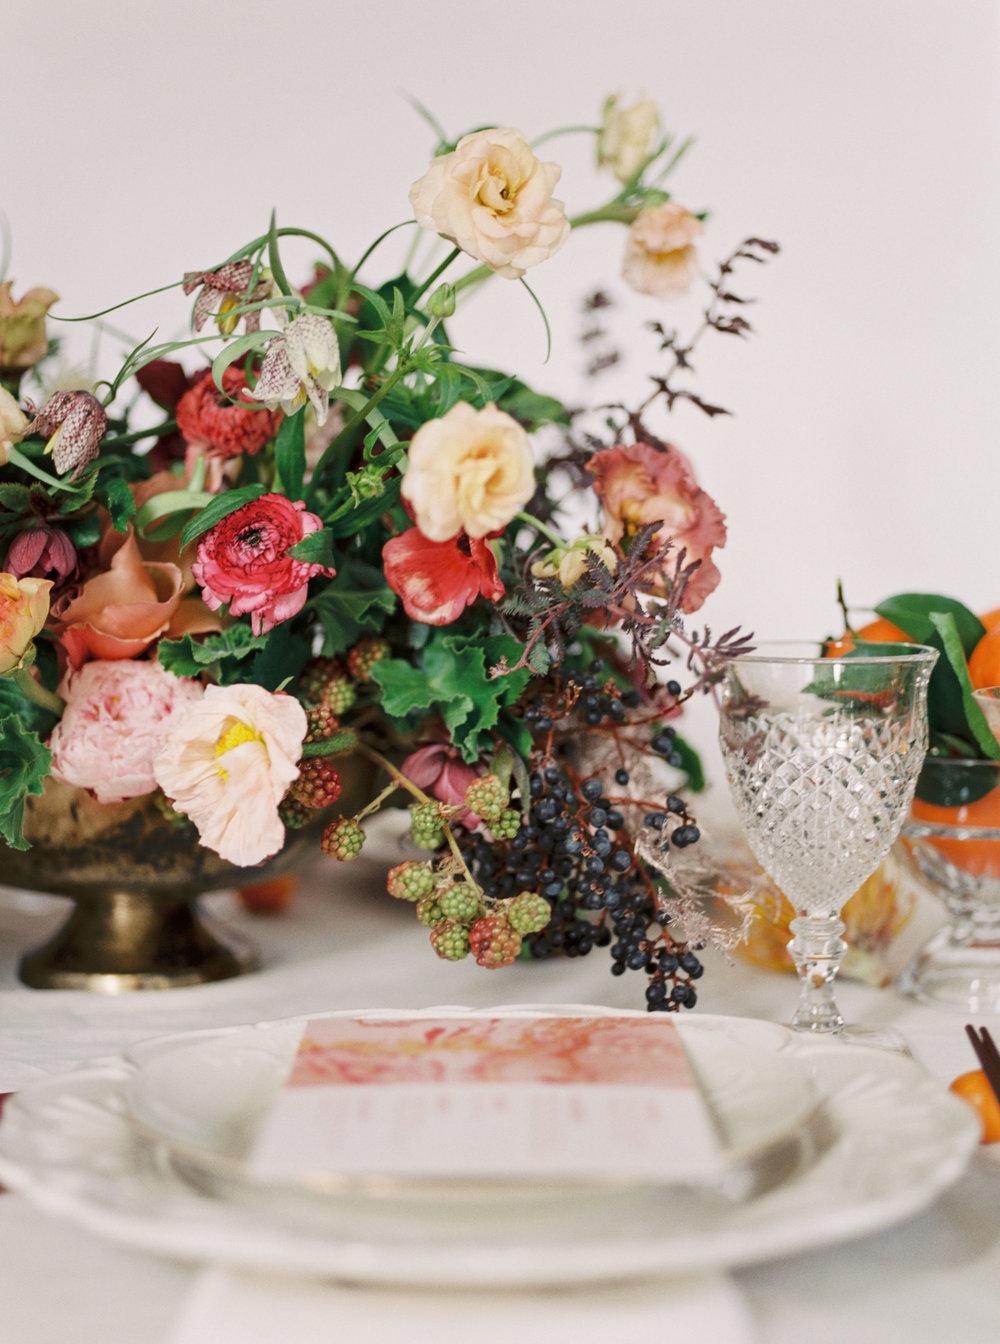 Carlos-Hernandez-Wedding-Film-Photography-Chinese-Year-Celebration-With-Joy-Proctor-068.jpg